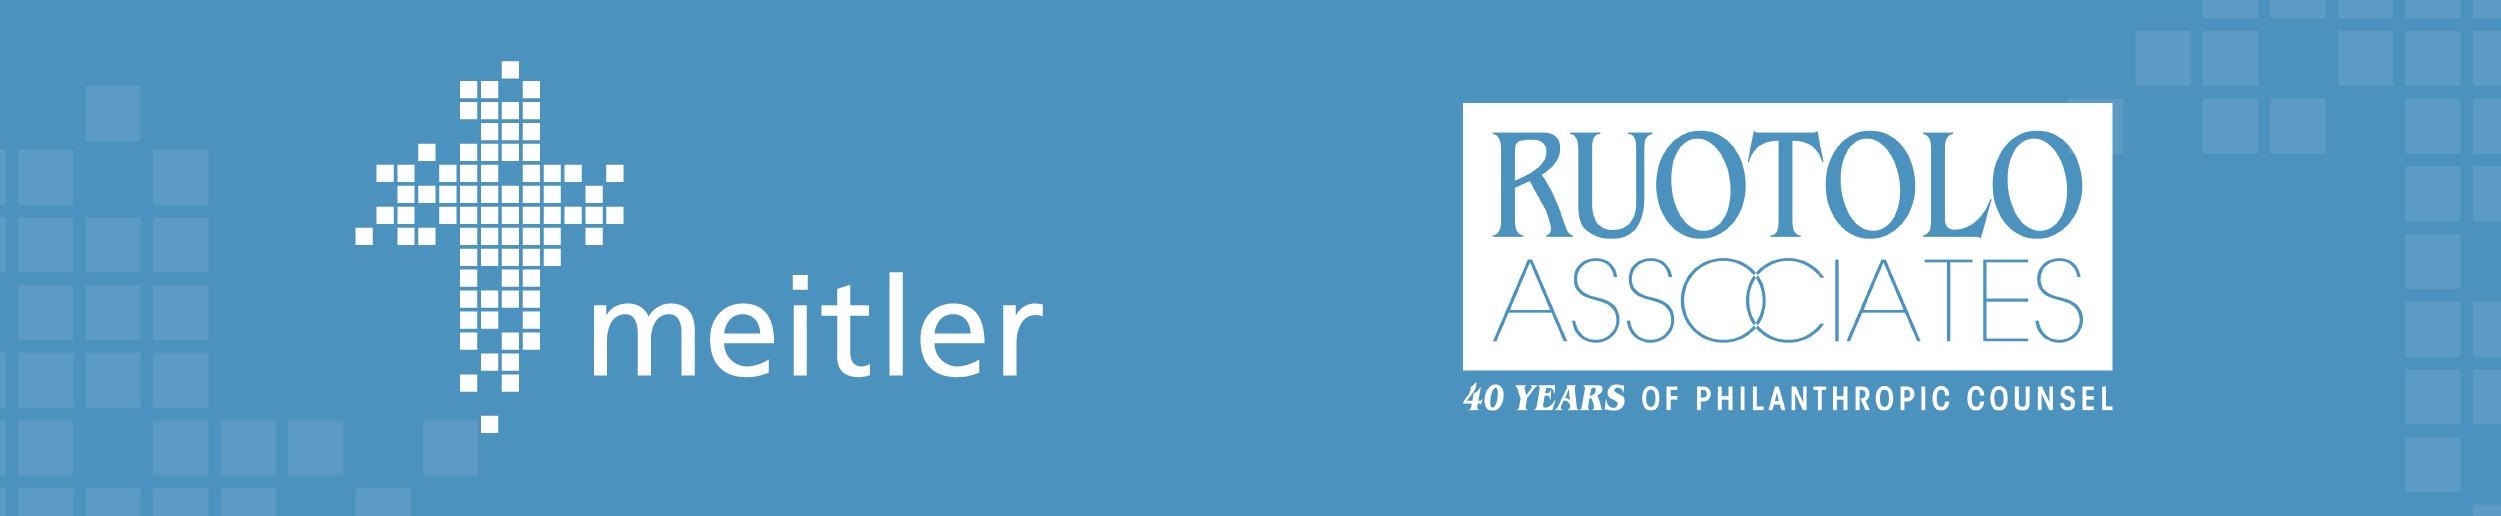 2020-10-07_MeitlerRuotoloAnnouncement_Email-01